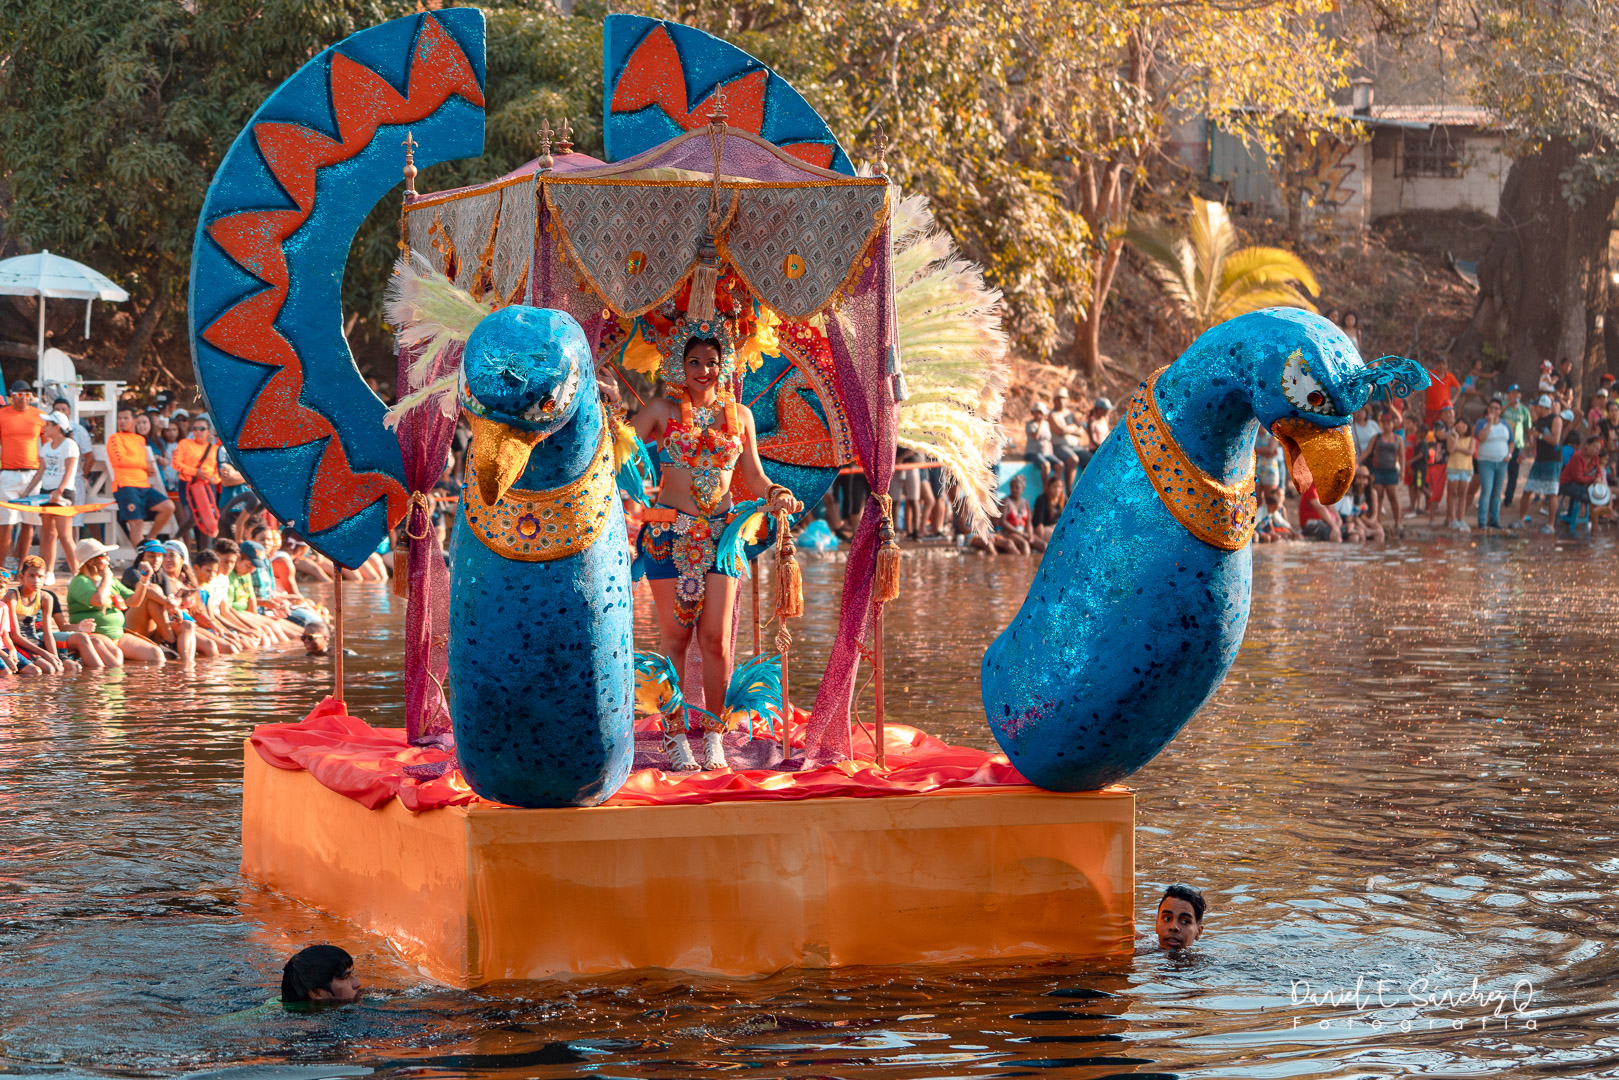 Carnaval Acuático de Penonomé - Provincia de Coclé